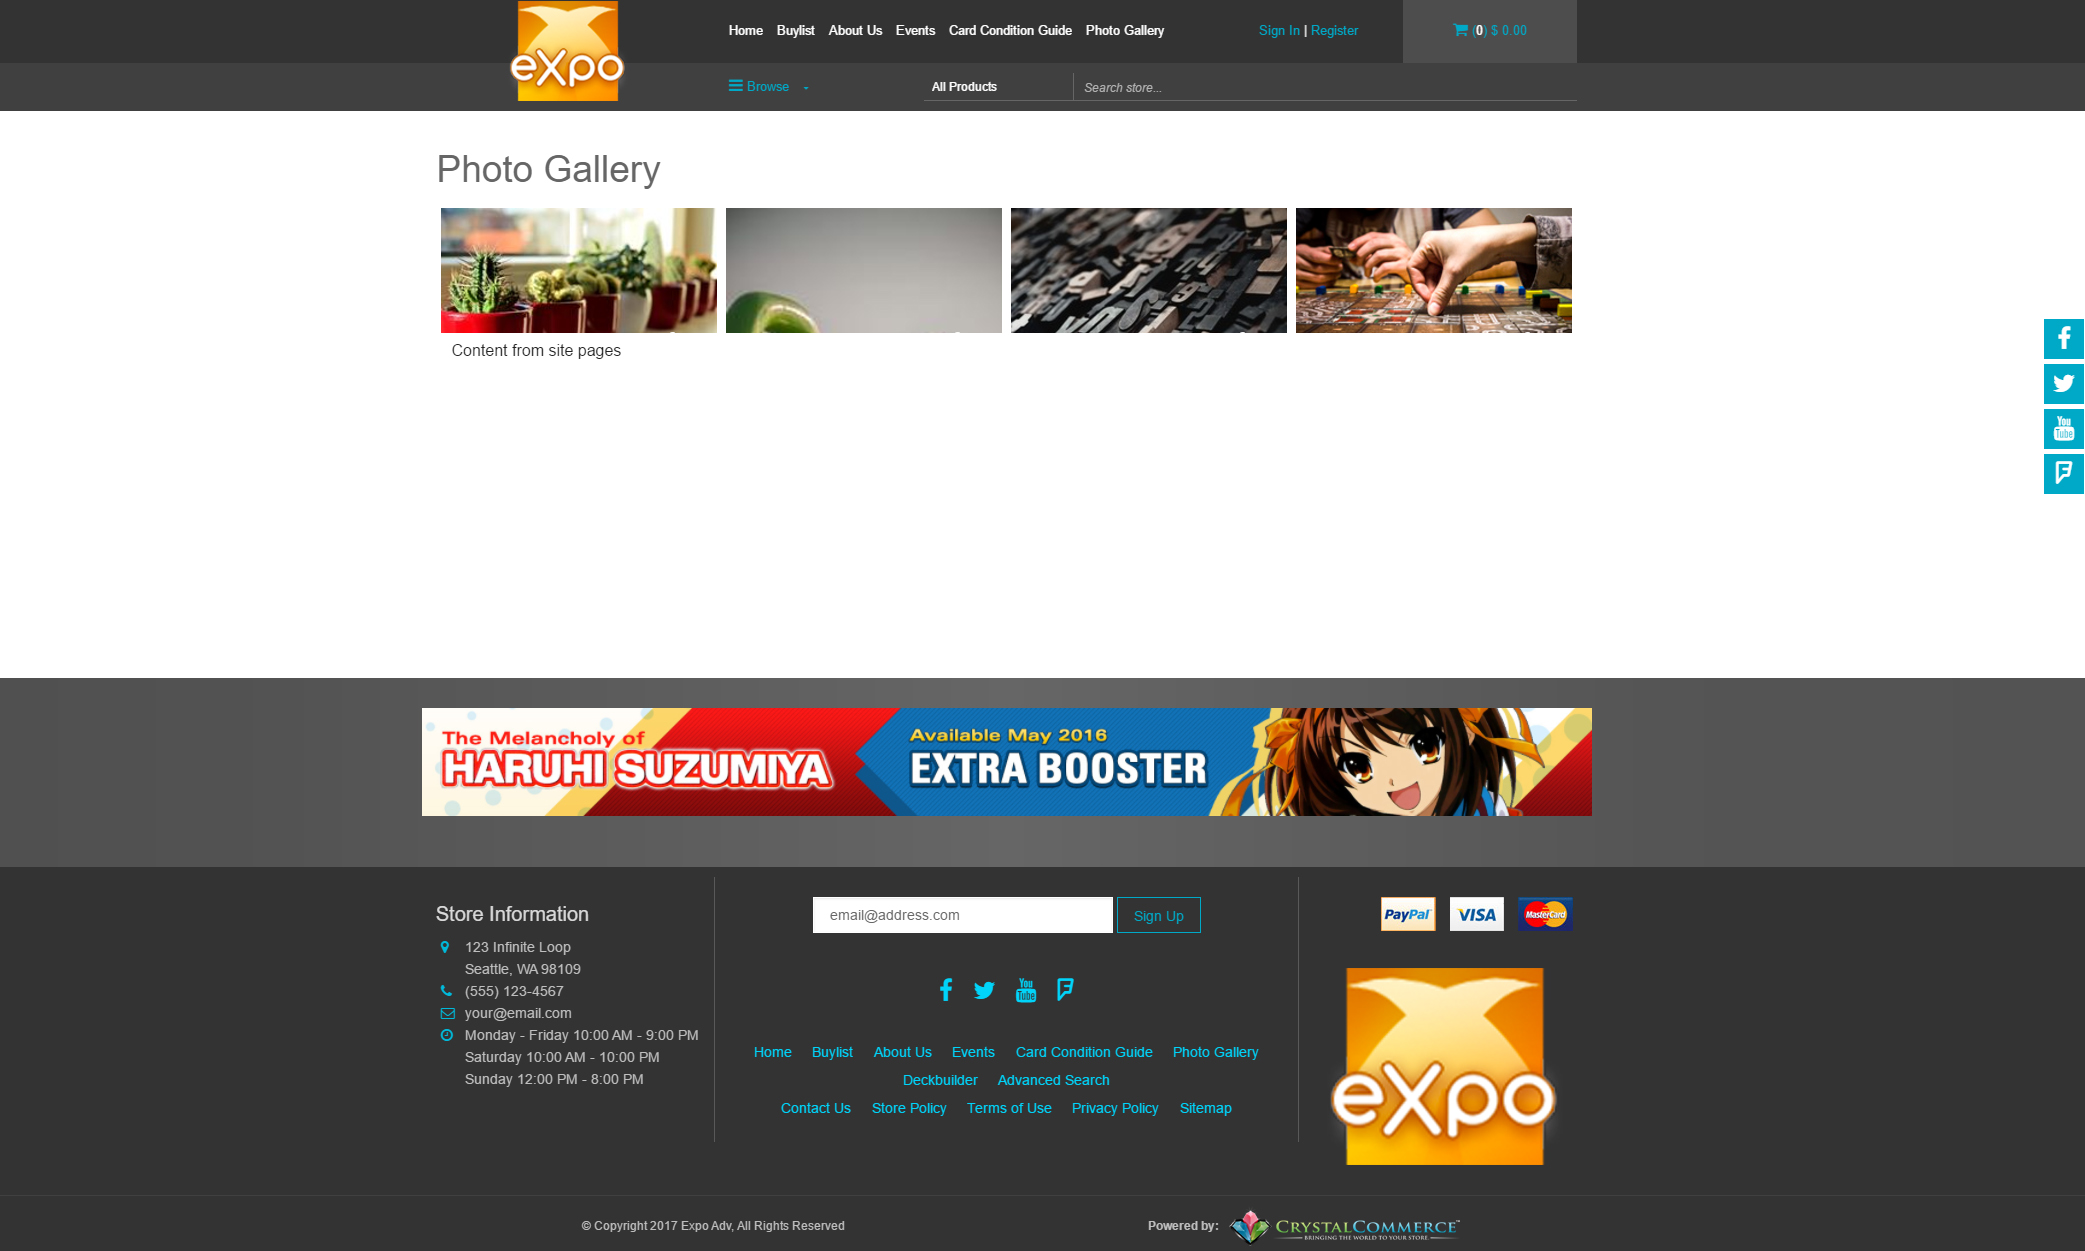 Expo - Premium Theme